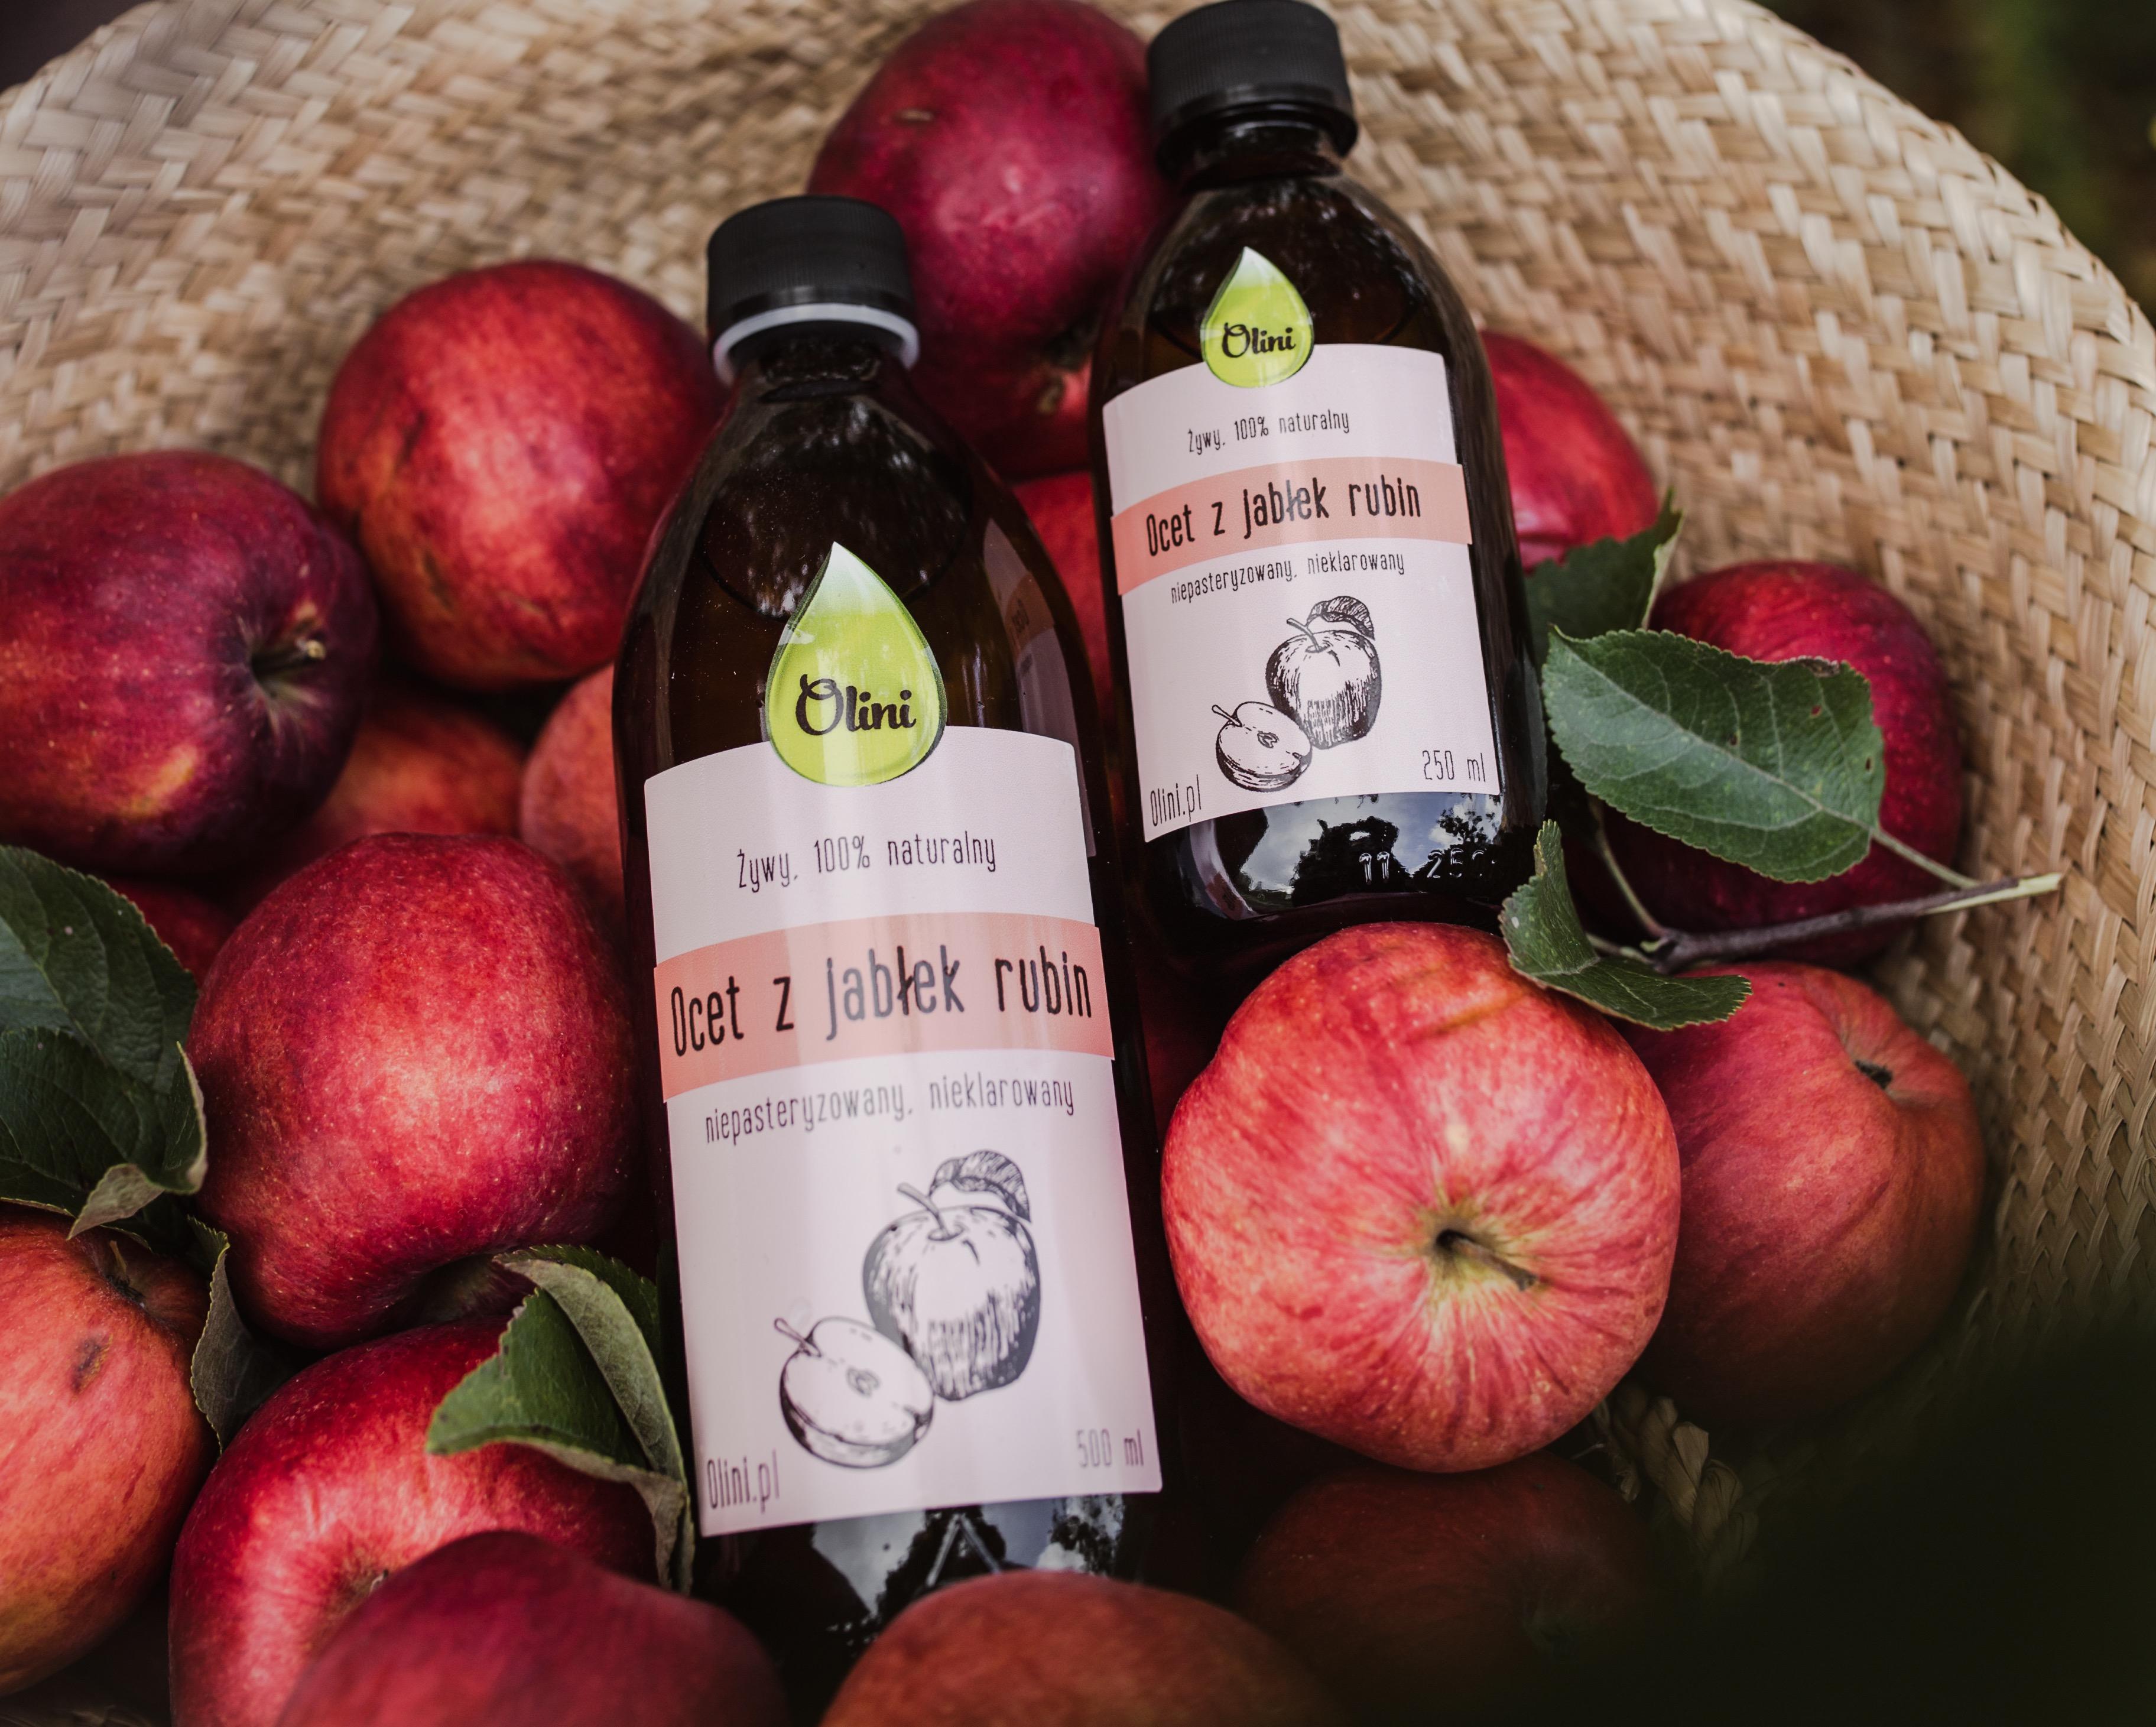 Ocet z jabłek i jabłek Rubin